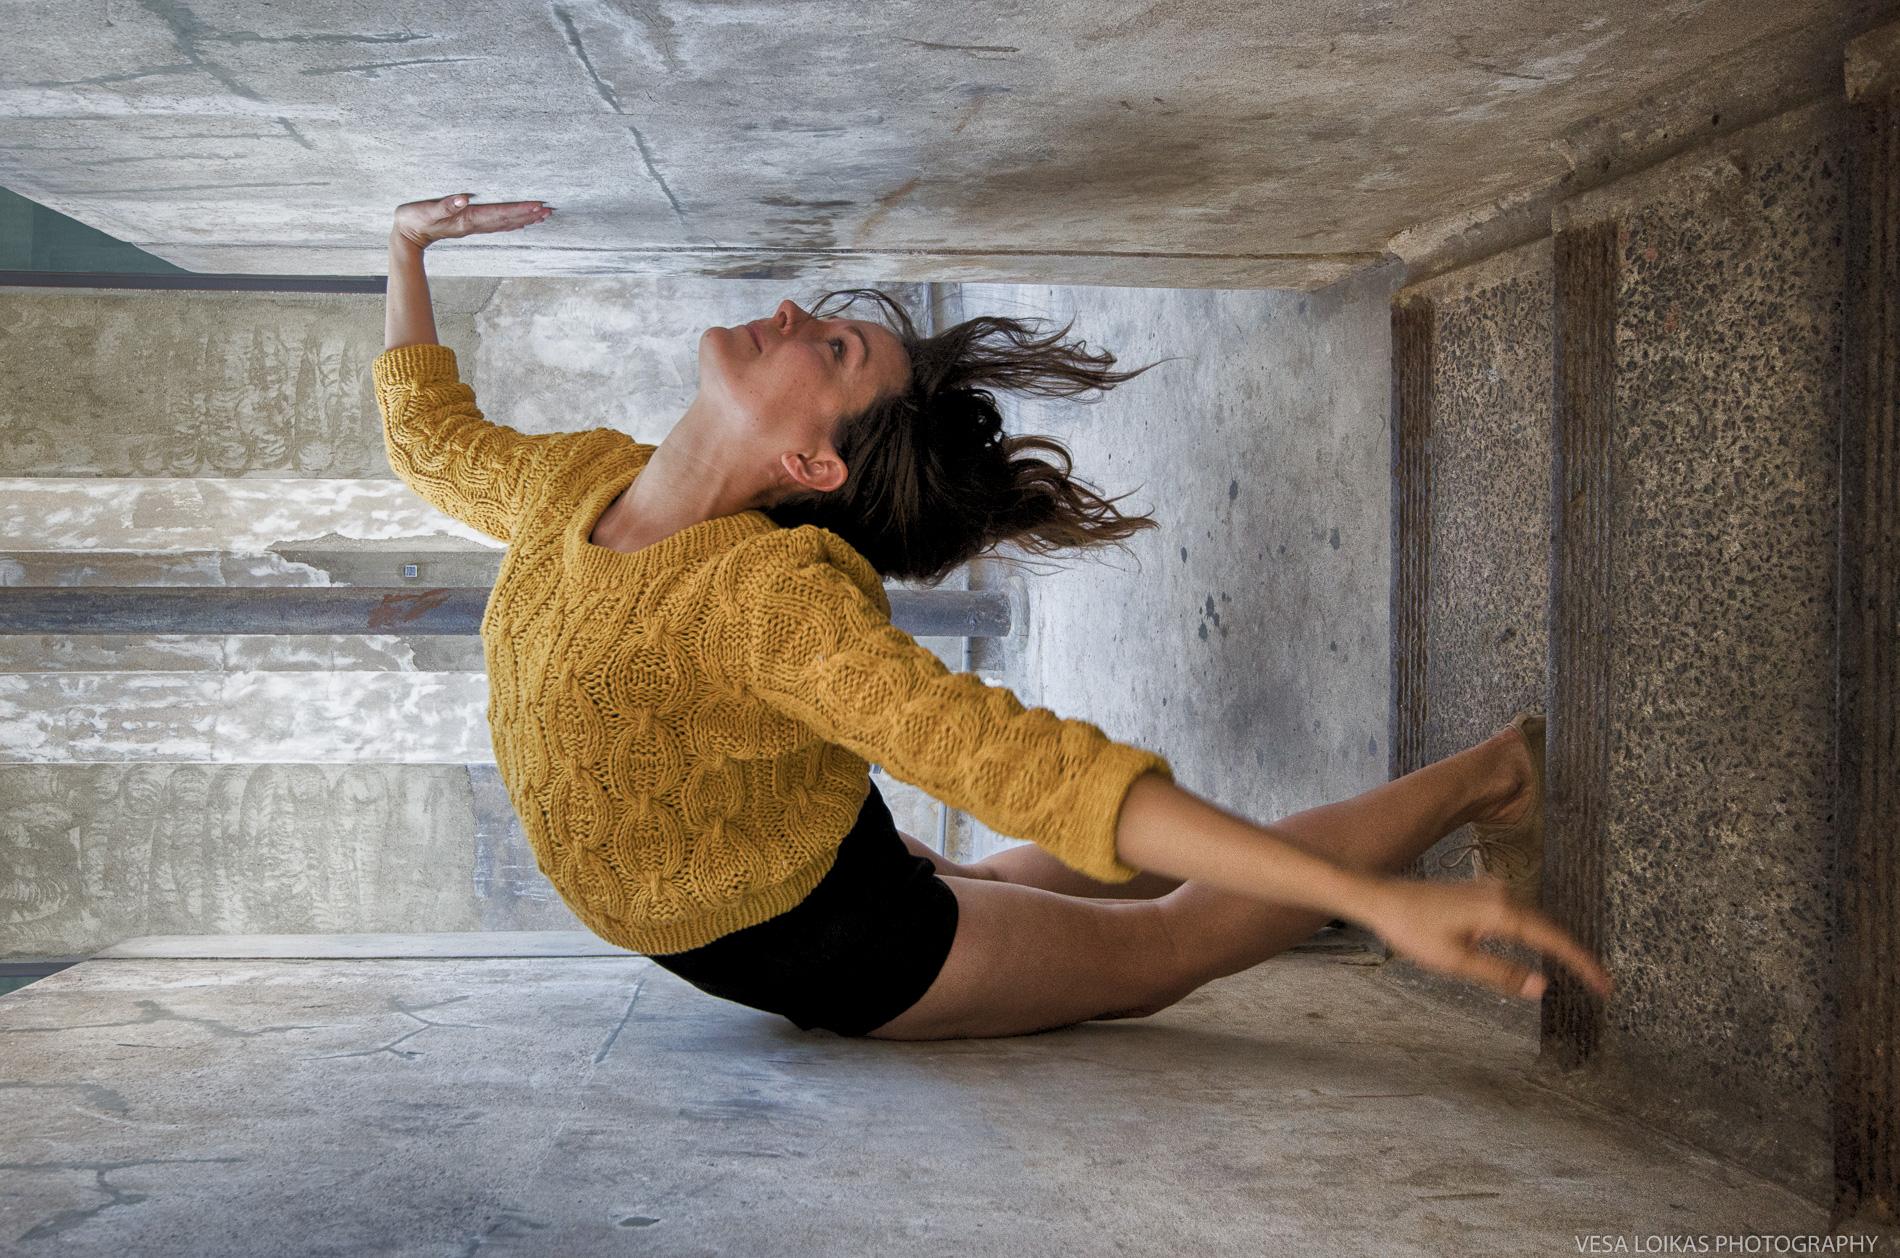 small_SET2_005_Concrete_Dreams_Shanghai_Oct_24_2014_Vesa_Loikas_Photography.jpg